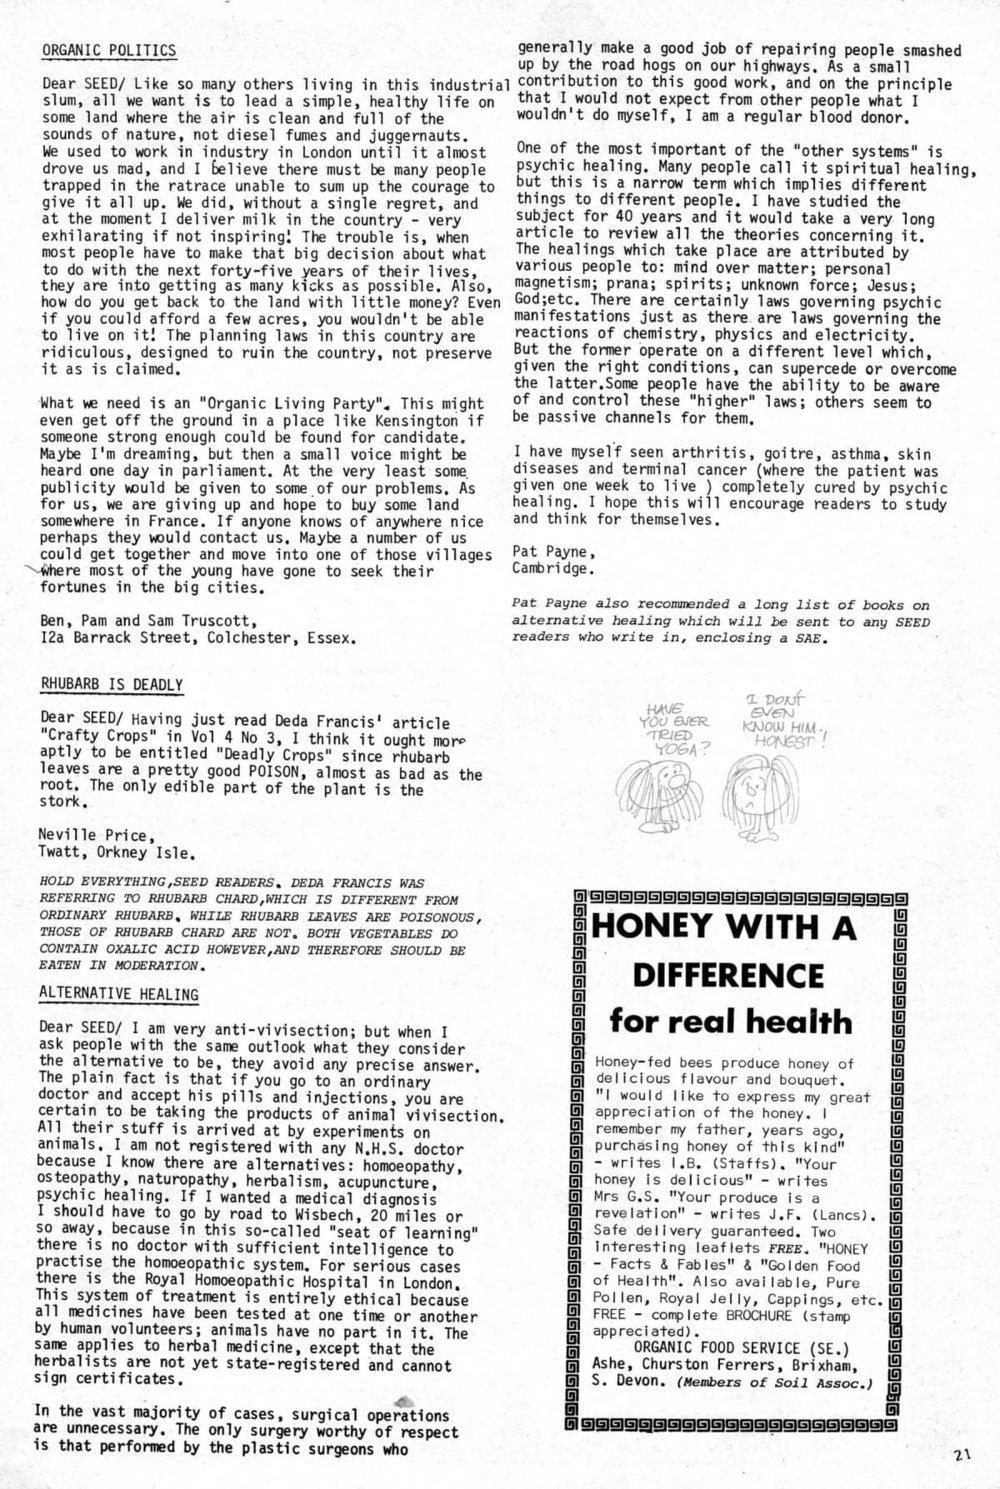 seed-v4-n4-april1975-21.jpg